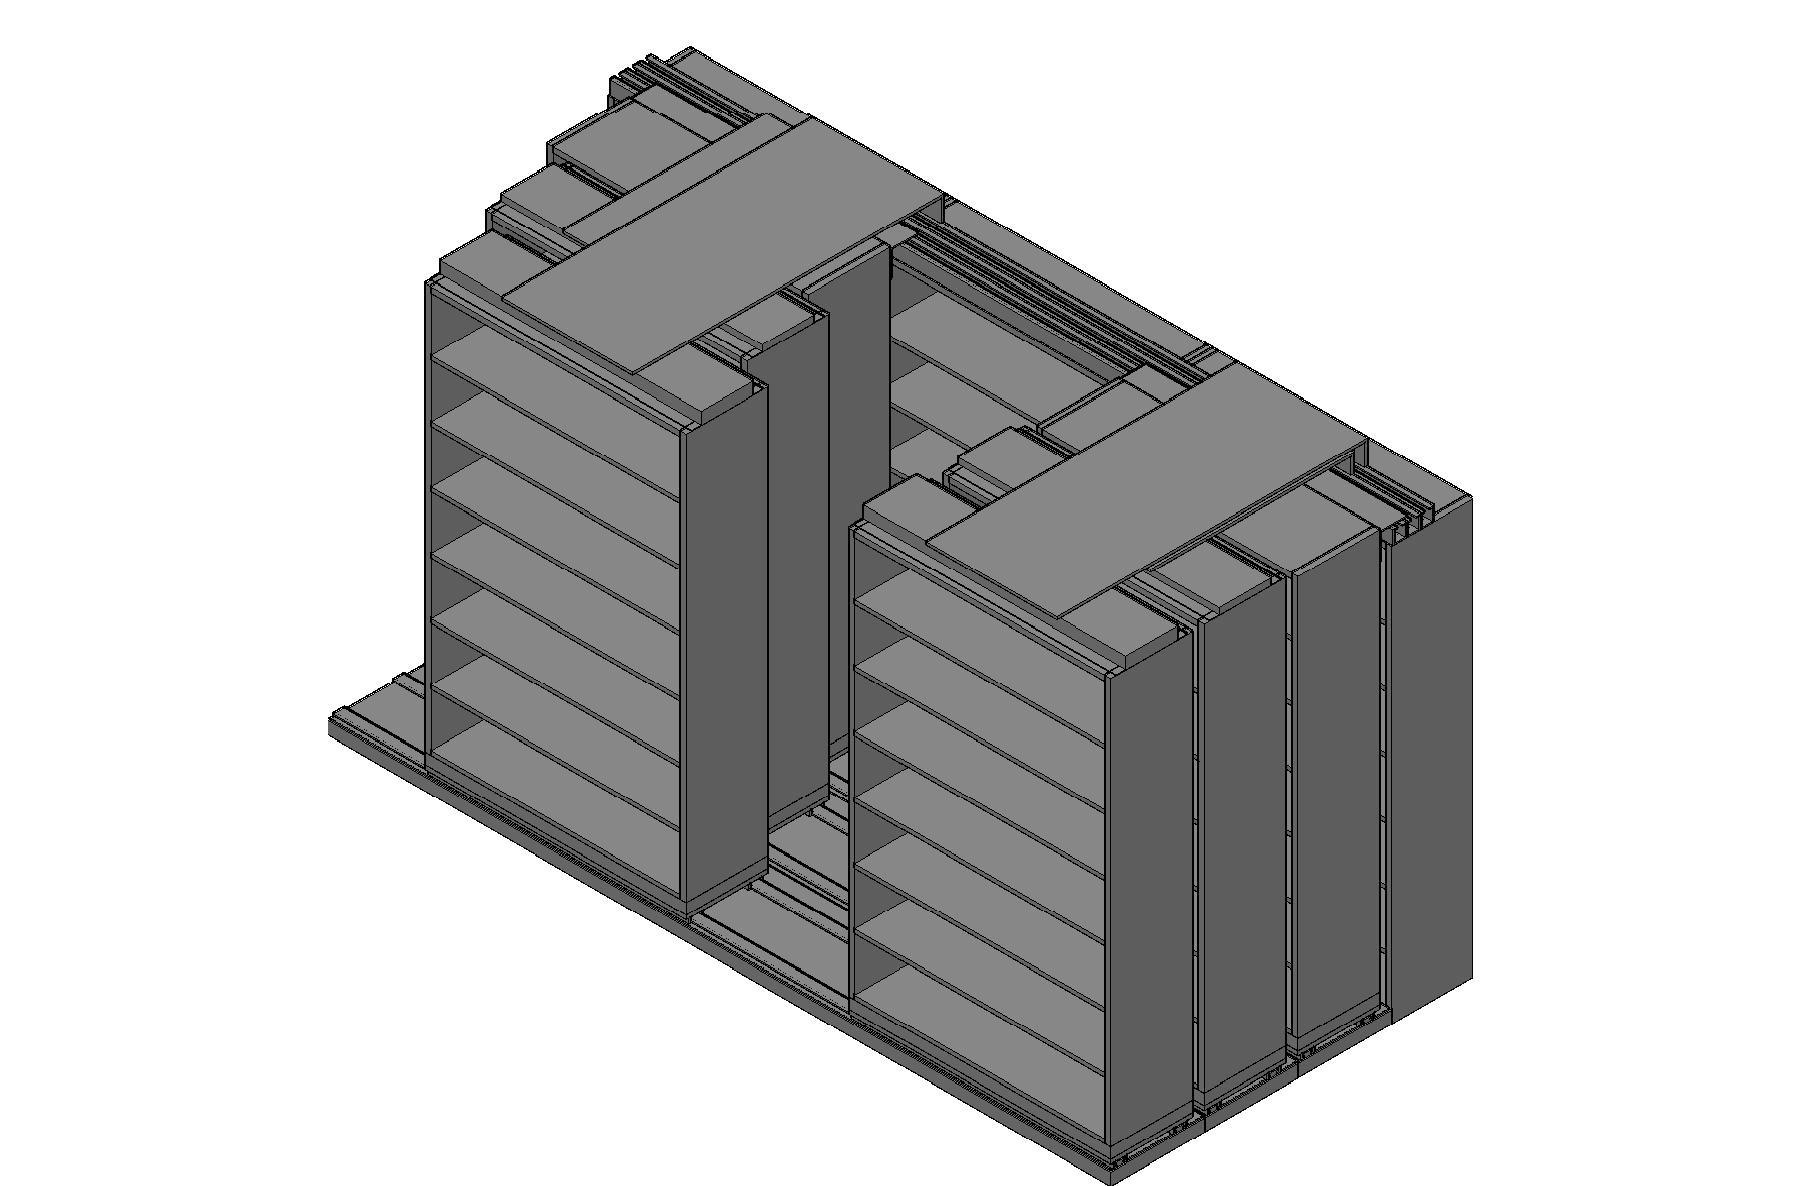 "Legal Size Sliding Shelves - 4 Rows Deep - 7 Levels - (48"" x 15"" Shelves) - 148"" Total Width"